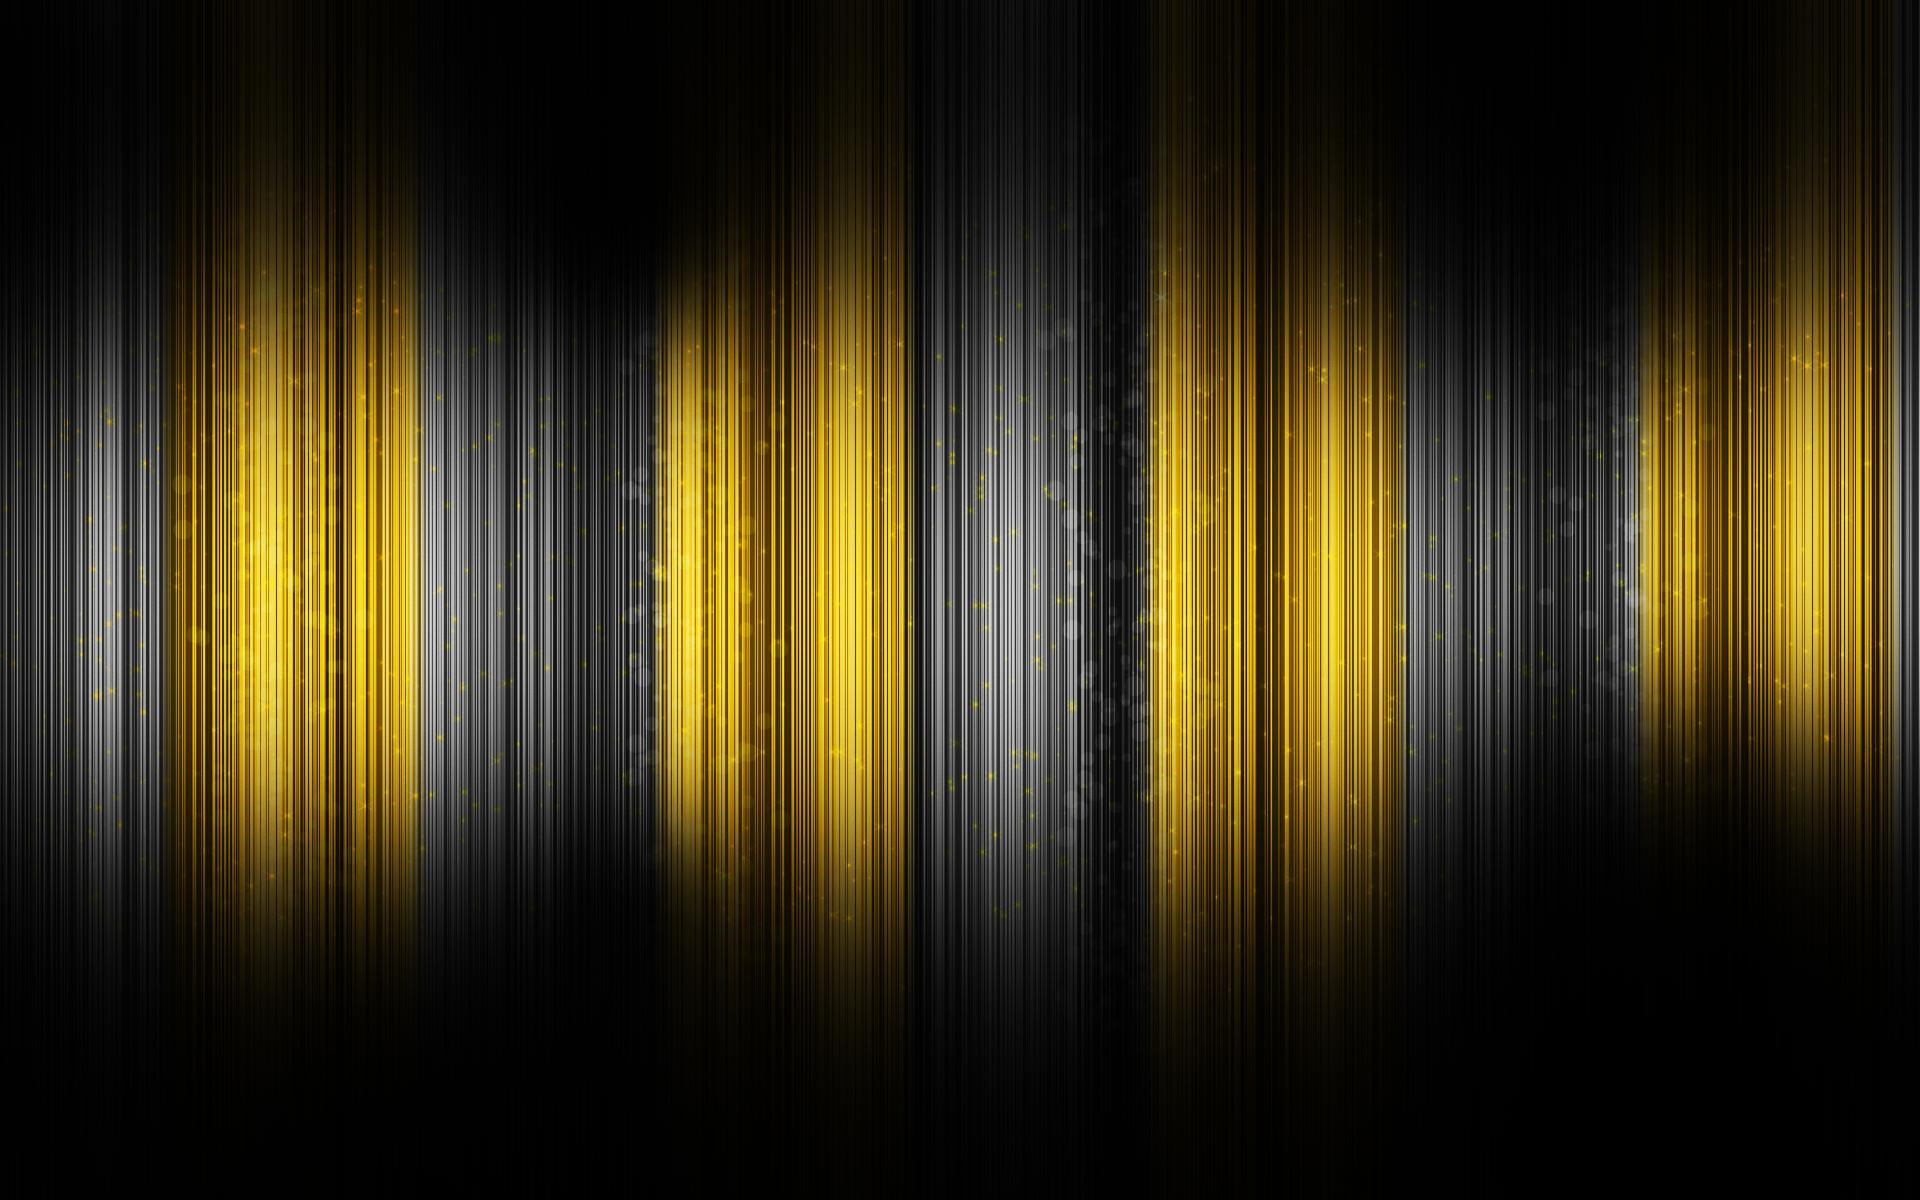 Black And Gold Abstract Wallpaper 11 Hd Wallpaper 1920x1200